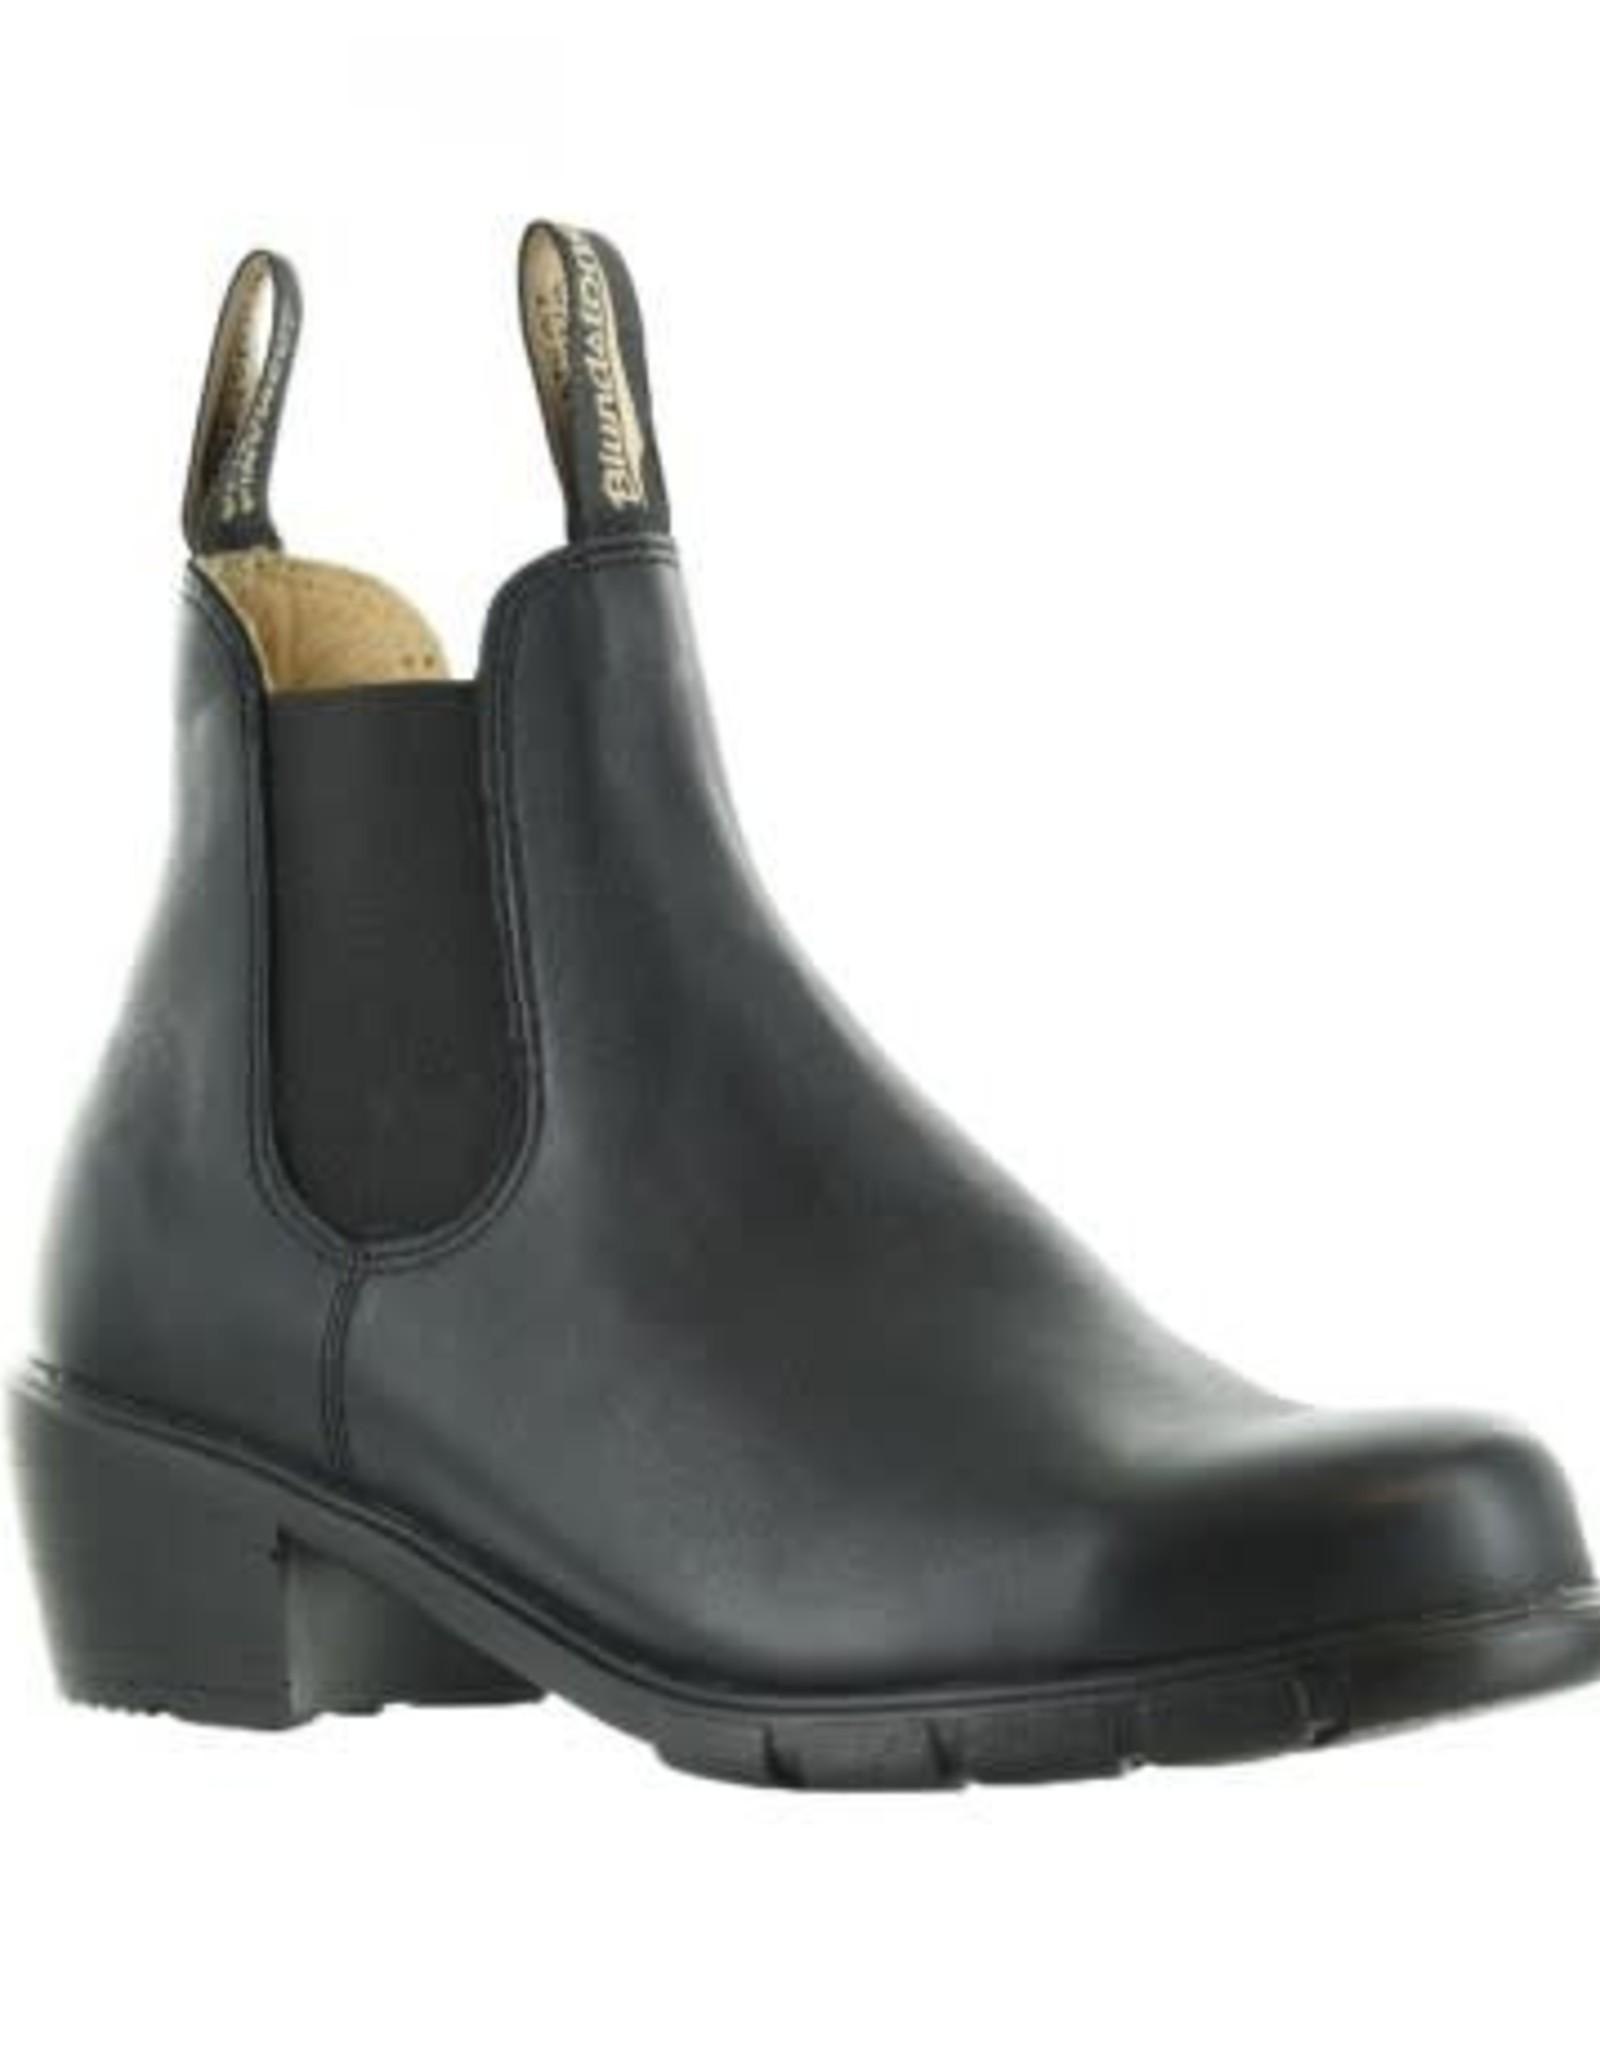 Blundstone Blundstone, Black, Heel 1671, 1WIDTH, 7.5